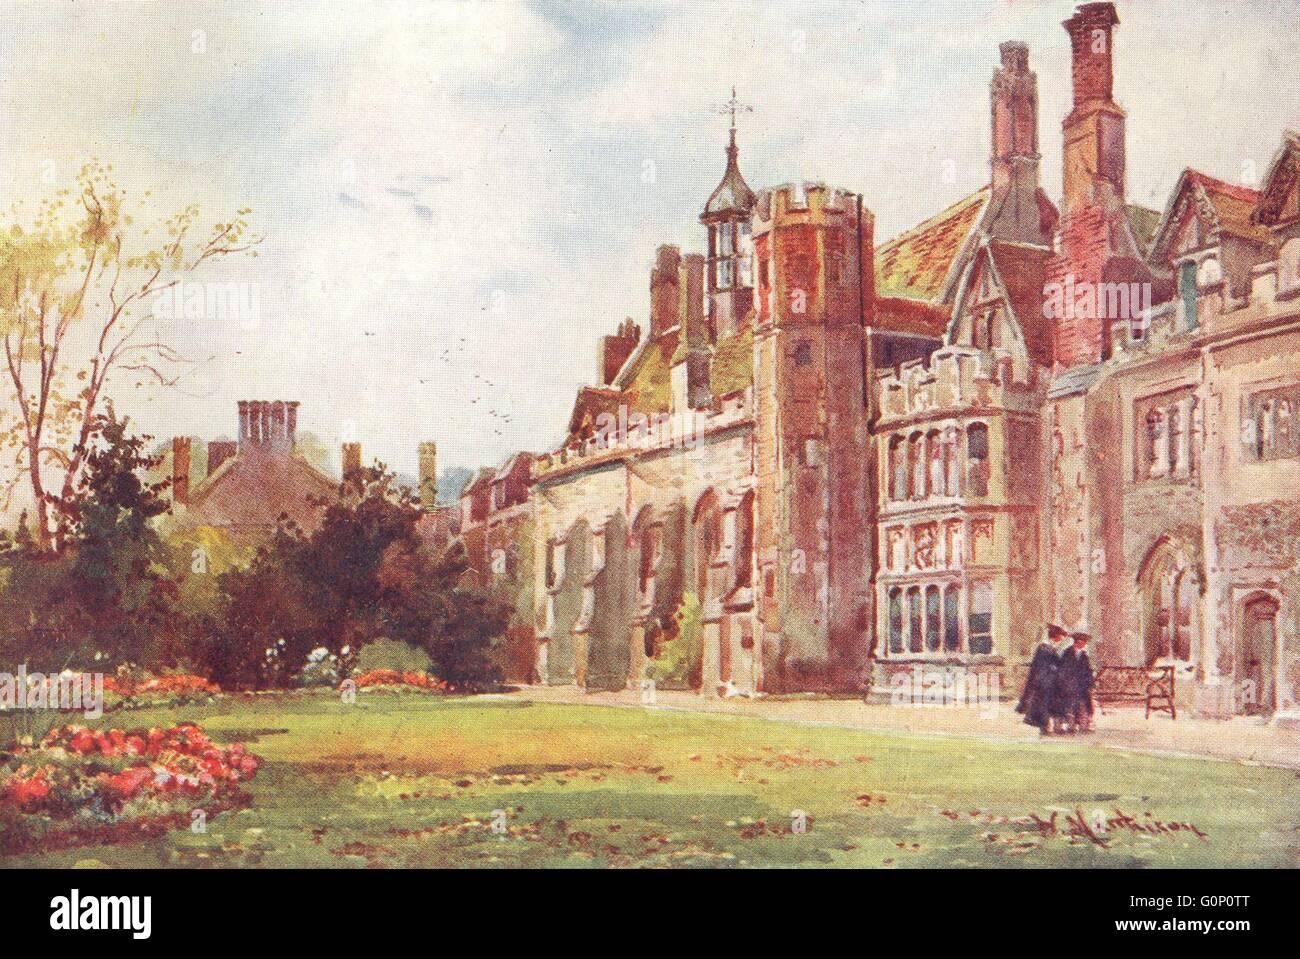 CAMBRIDGE: Colleges: Peterhouse Fellow's garden, antique print 1907 - Stock Image